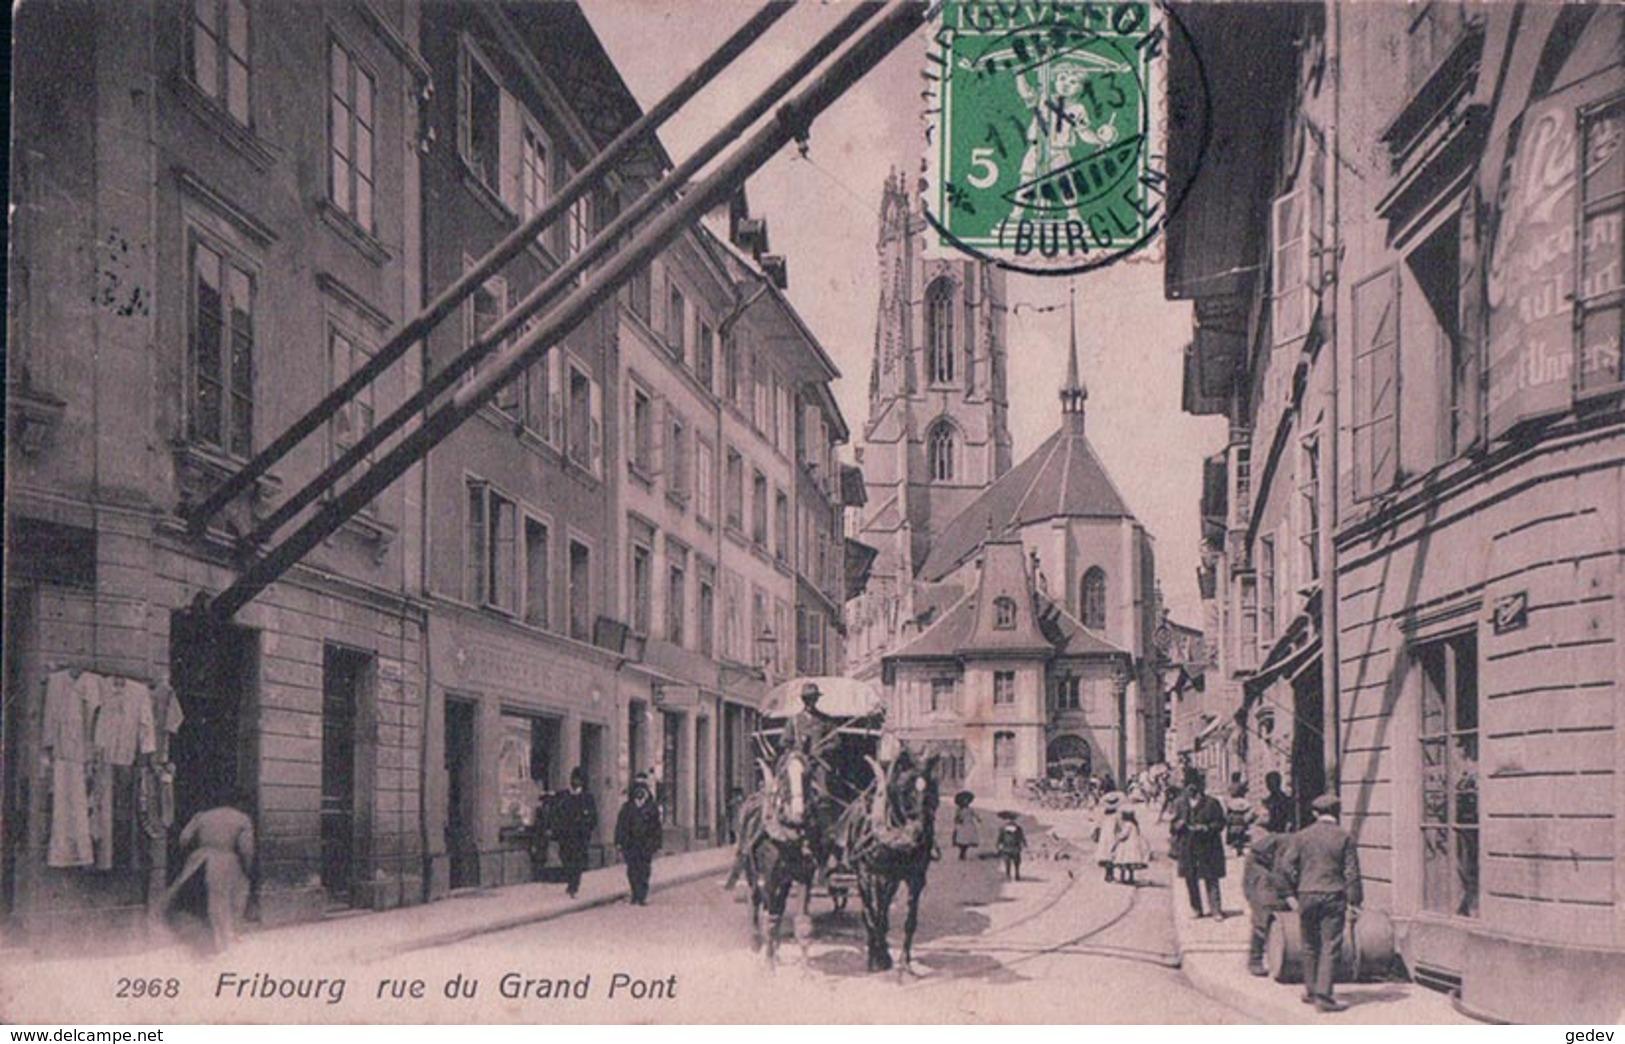 Fribourg, Diligence Rue Du Grand Pont, Attelage De 2 Chevaux (2968) - FR Fribourg